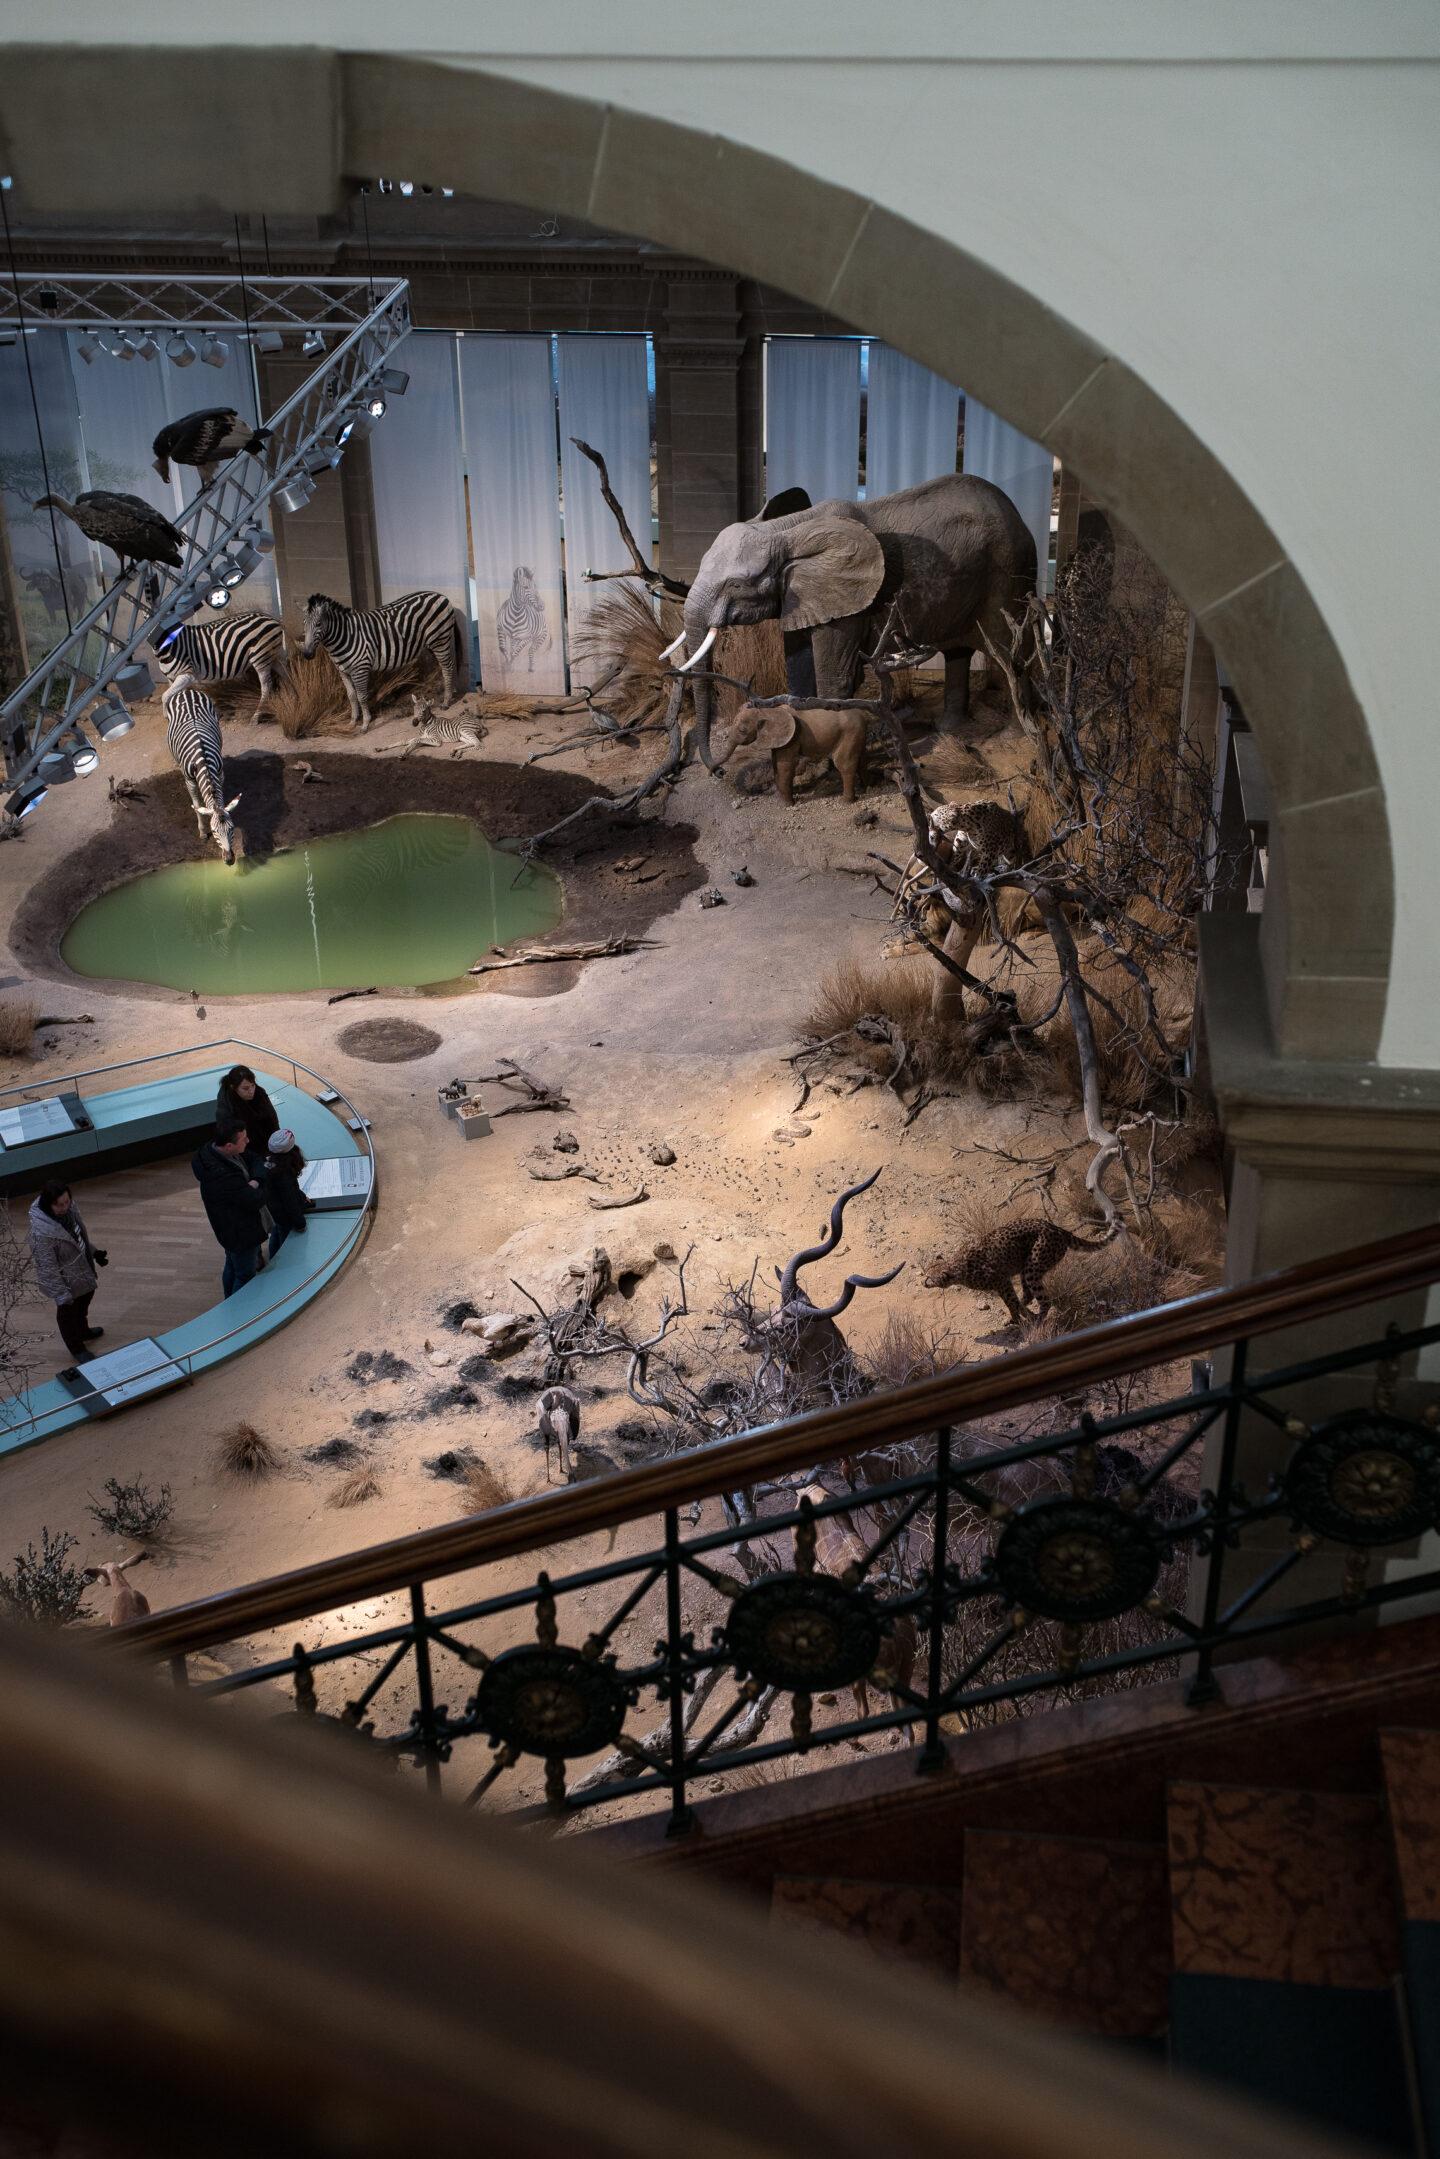 Karsten Rohrbeck: Studiis Zoologicis (13/17)